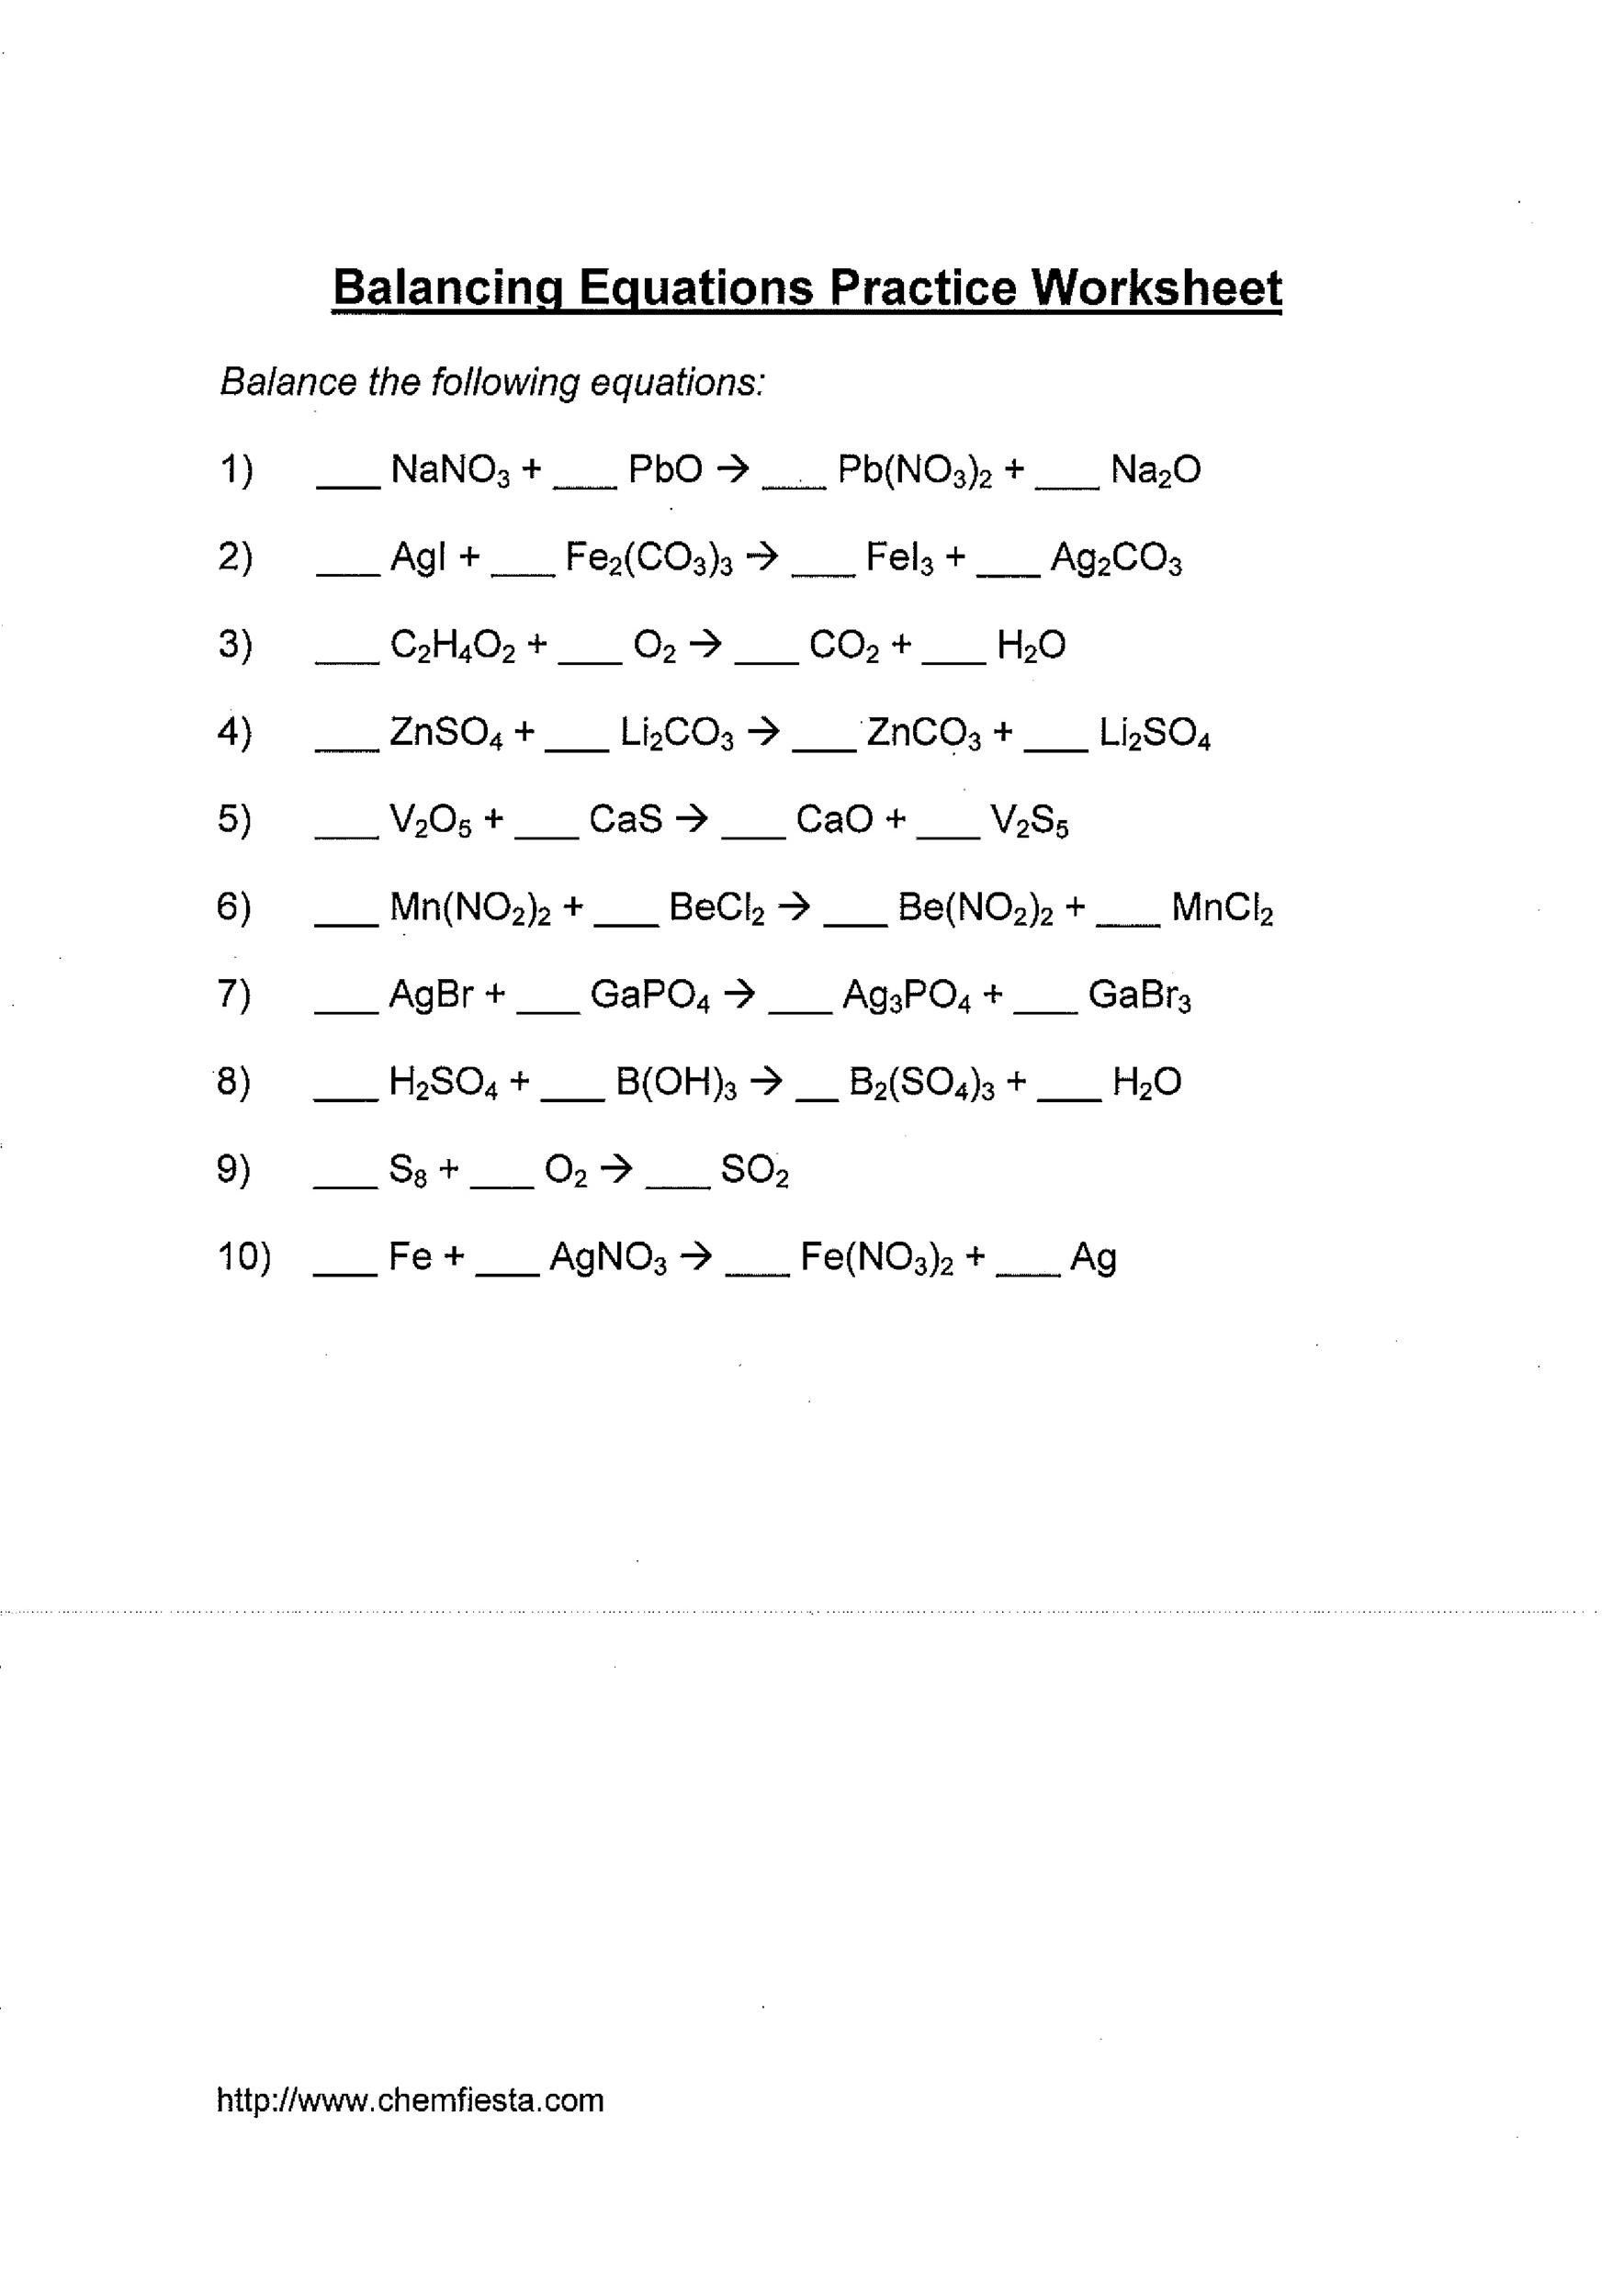 Balanced Equations Worksheet Balancing Act   Printable Worksheets and  Activities for Teachers [ 2500 x 1768 Pixel ]